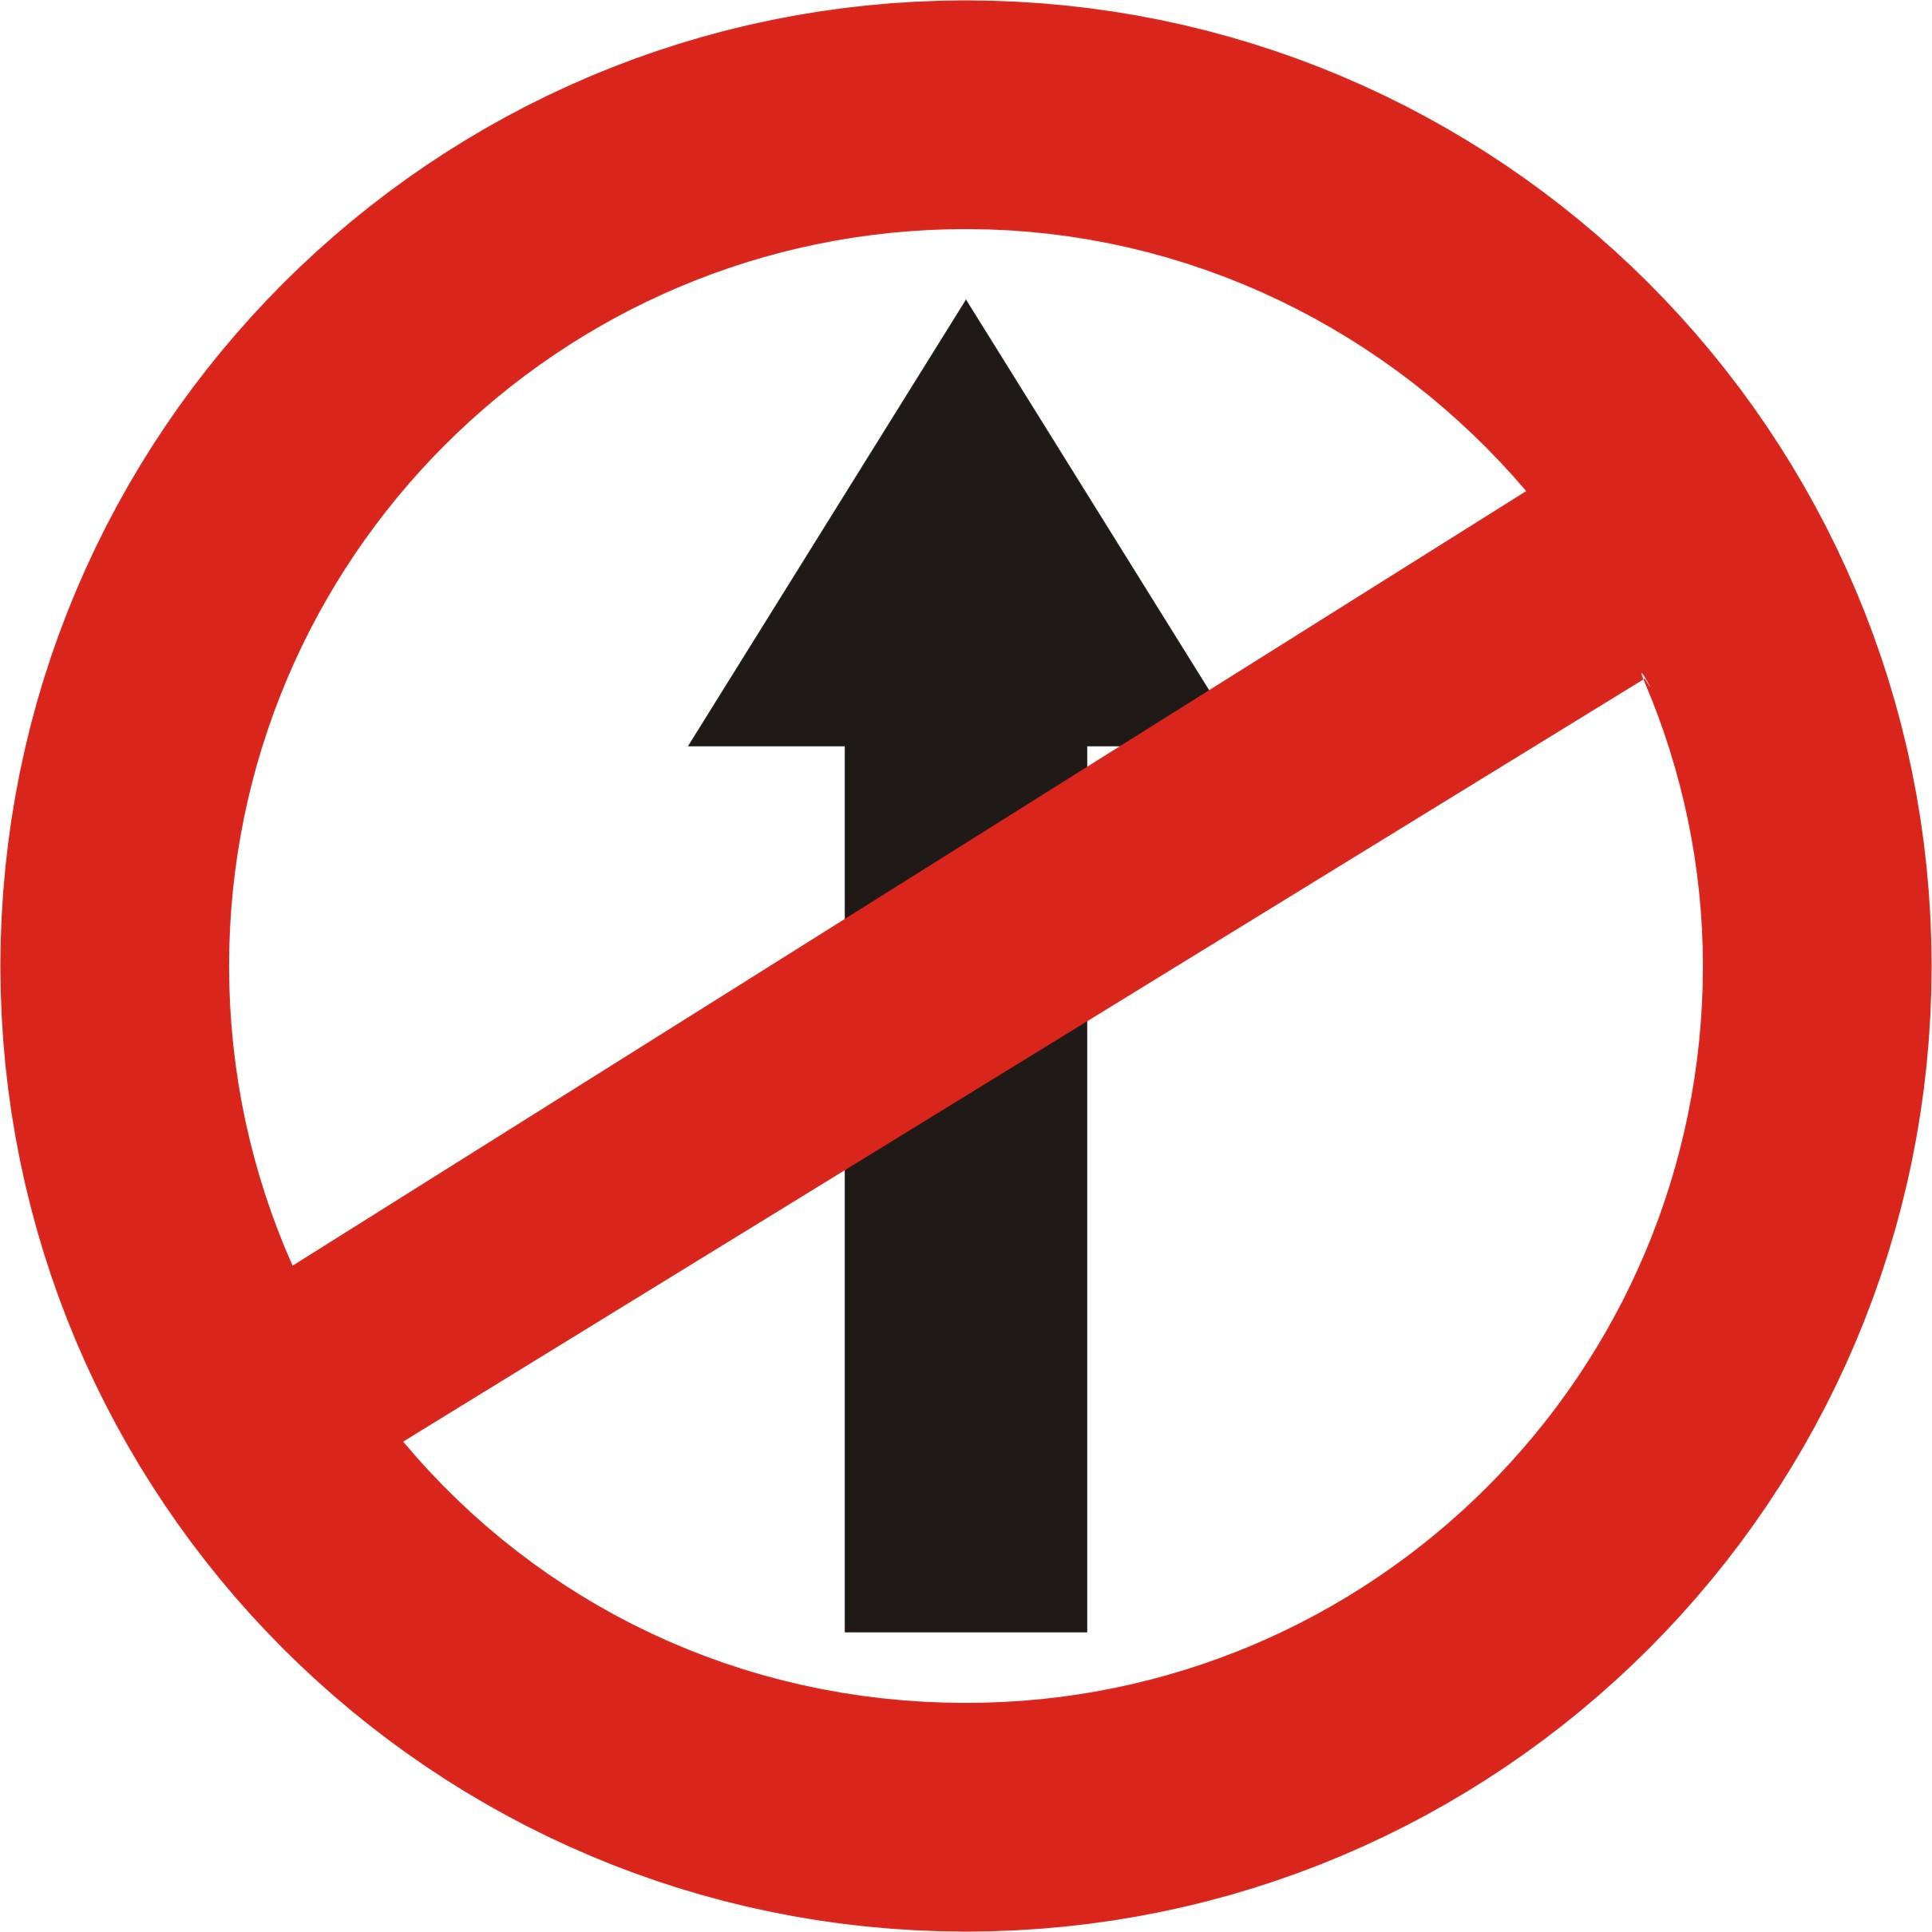 File:Road Sign No Entry.jpg